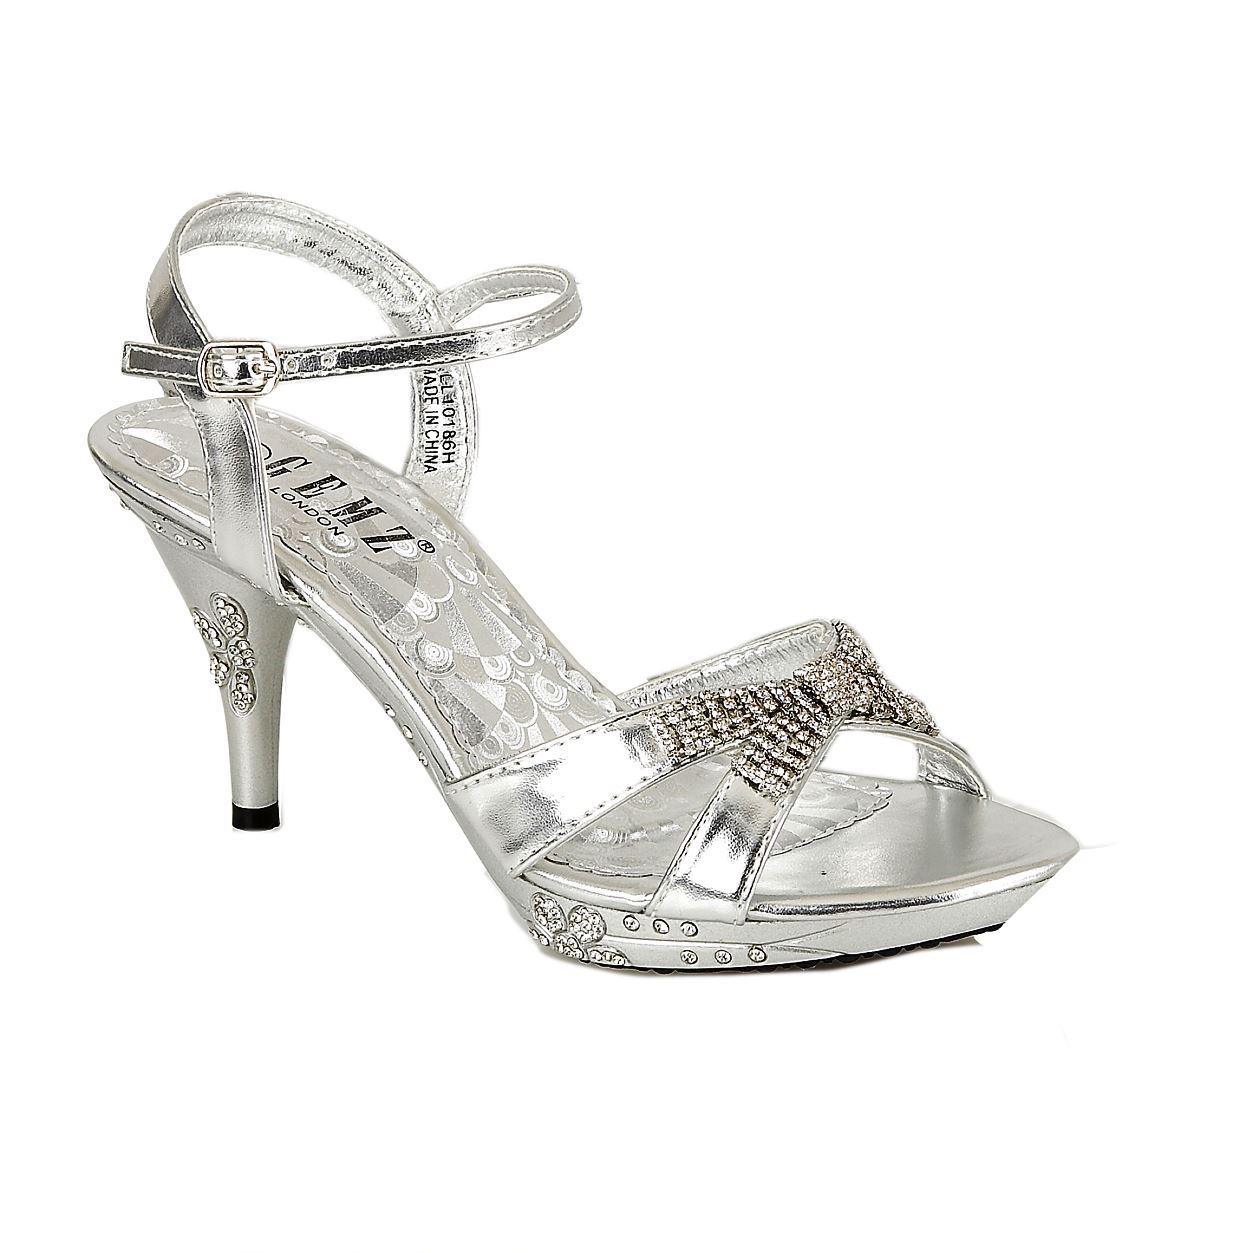 279 Womens Wedding Sandals High Heel Diamante Evening Prom Party Gemz London